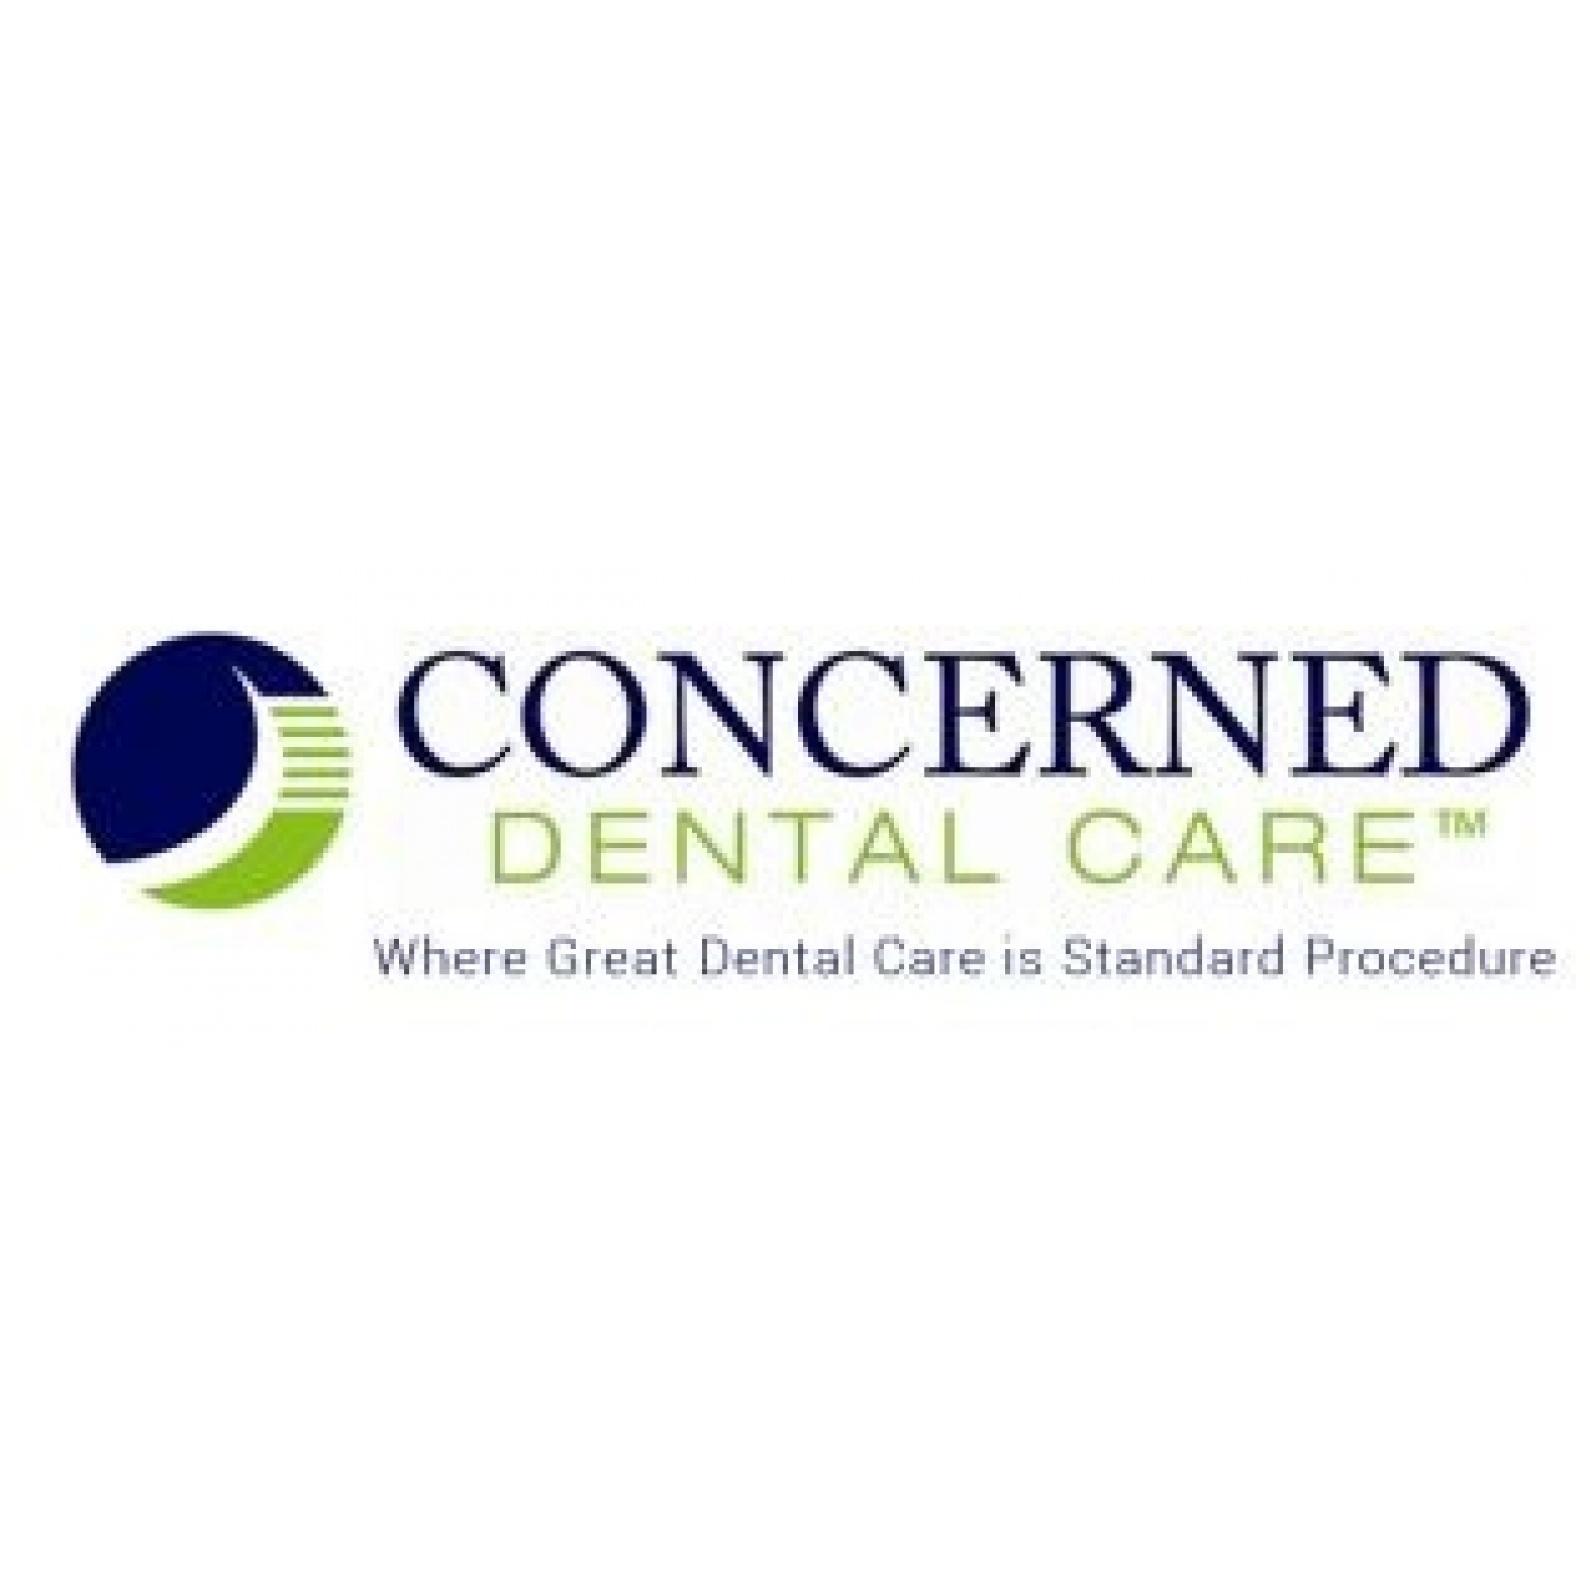 Concerned Dental Care (Manhattan)